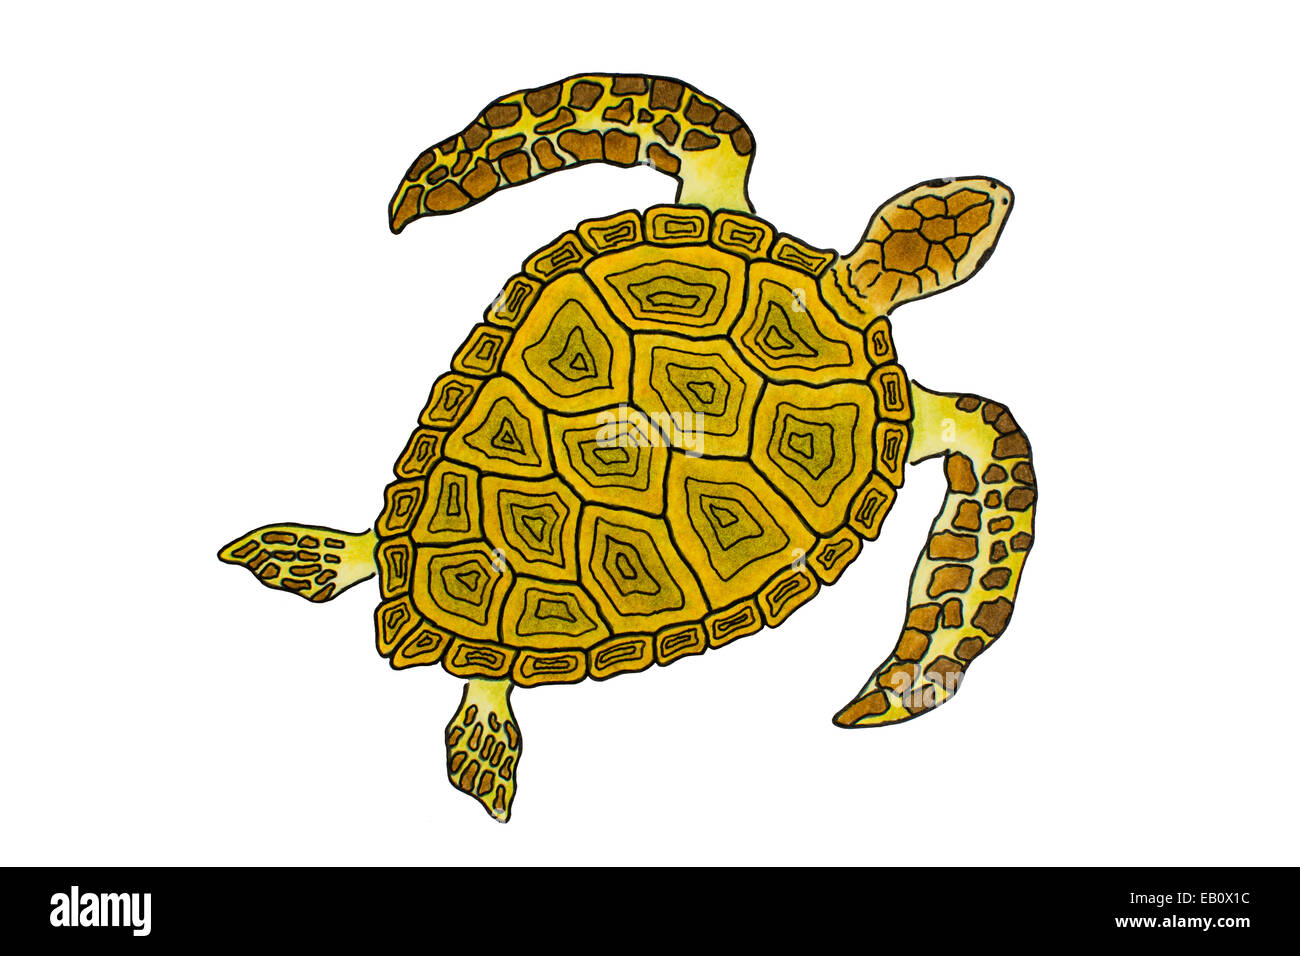 Turtle Drawing Imágenes De Stock & Turtle Drawing Fotos De Stock - Alamy